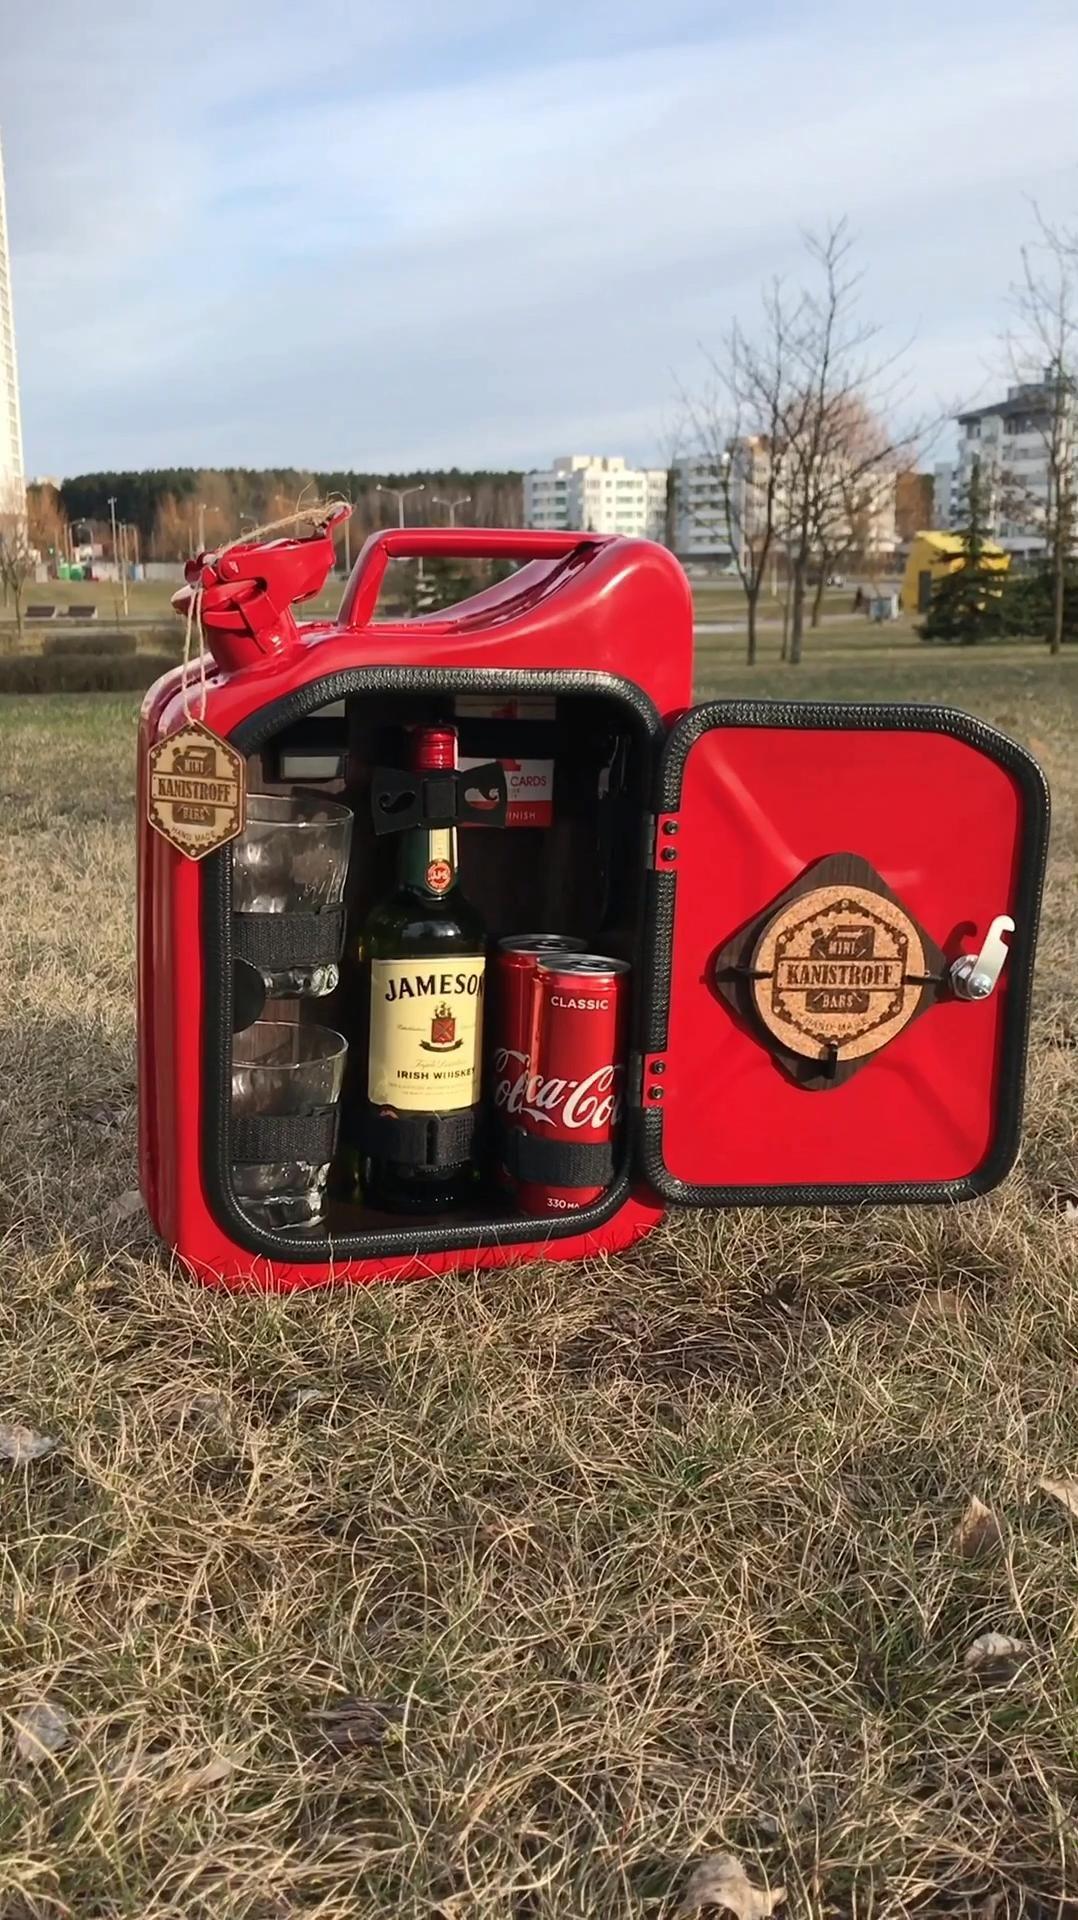 Jerry Can Mini Bar Whiskey Bar Liquor Bar Etsy Video Video In 2020 Jerry Can Mini Bar Mini Bar Jerry Can